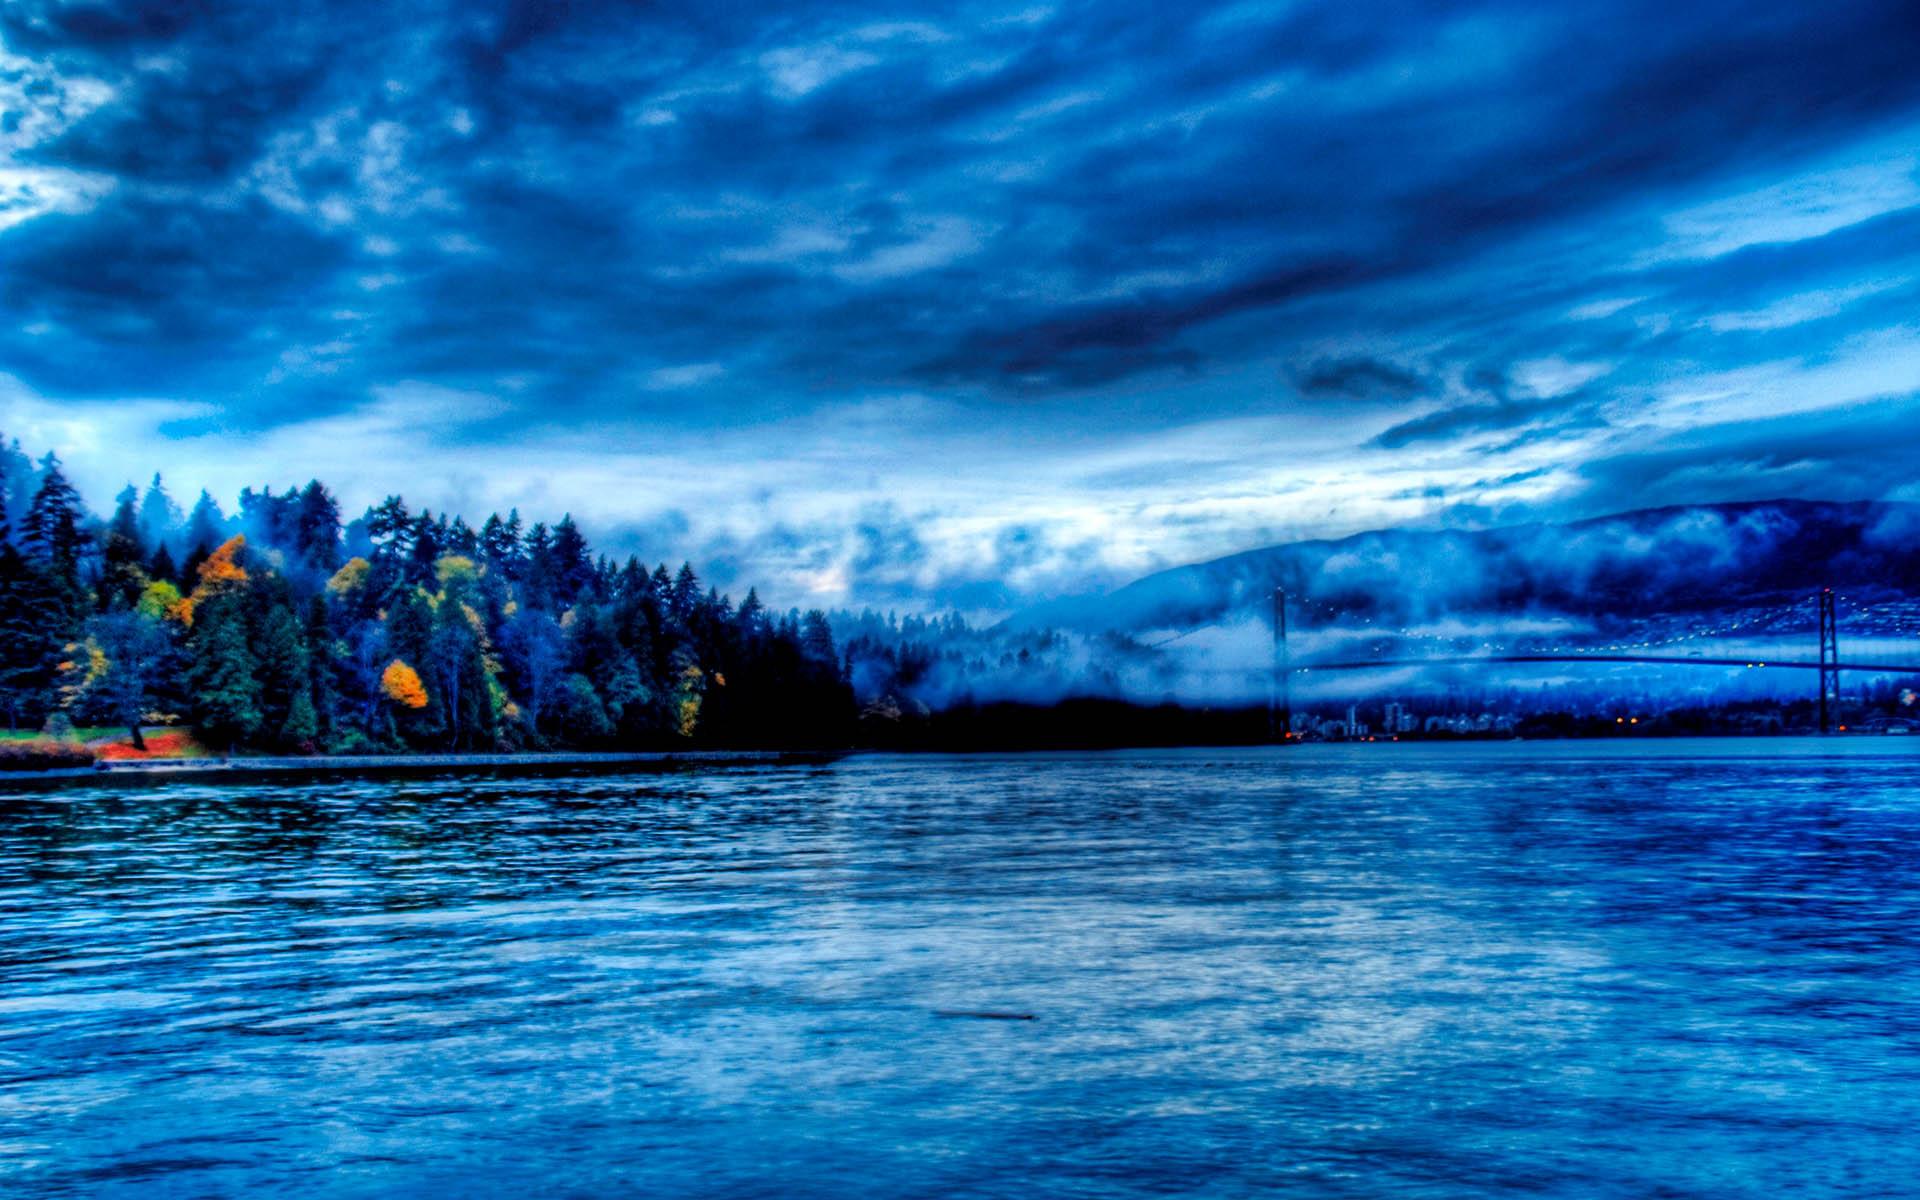 amazing-blue-water-hd-wallpaper-010